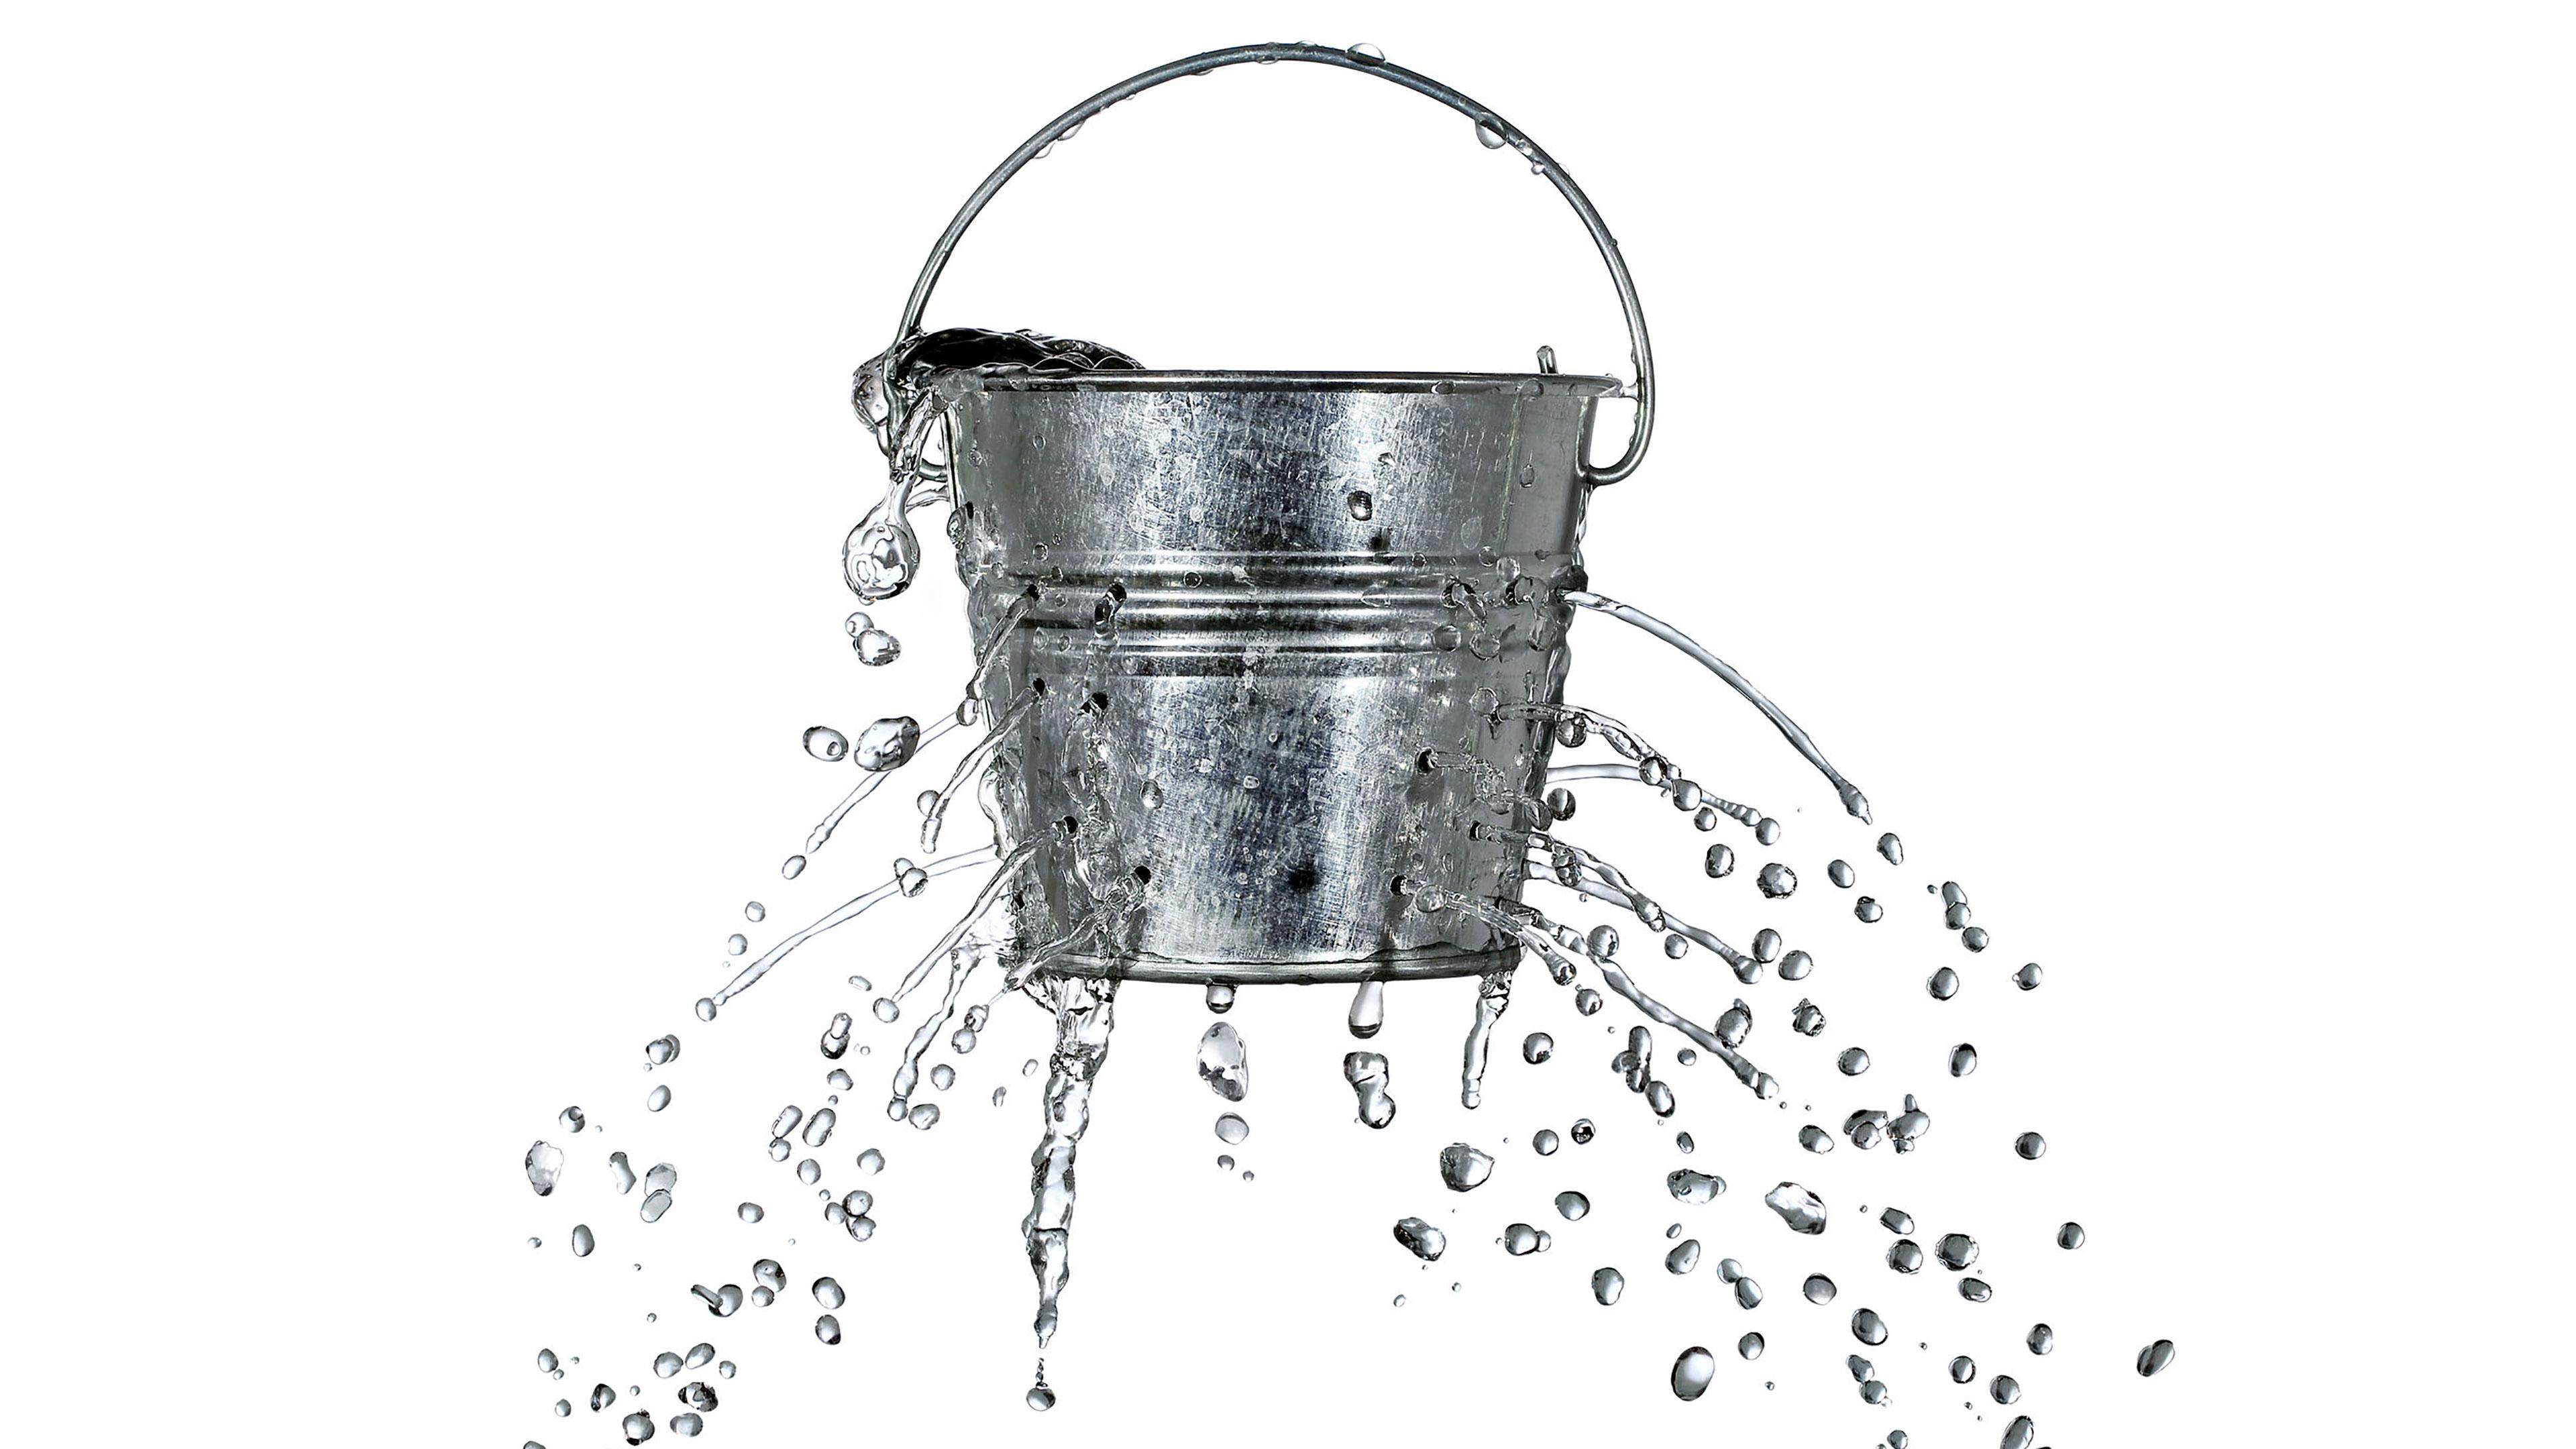 There S A Hole In The Bucket Dear Liza Dear Liza